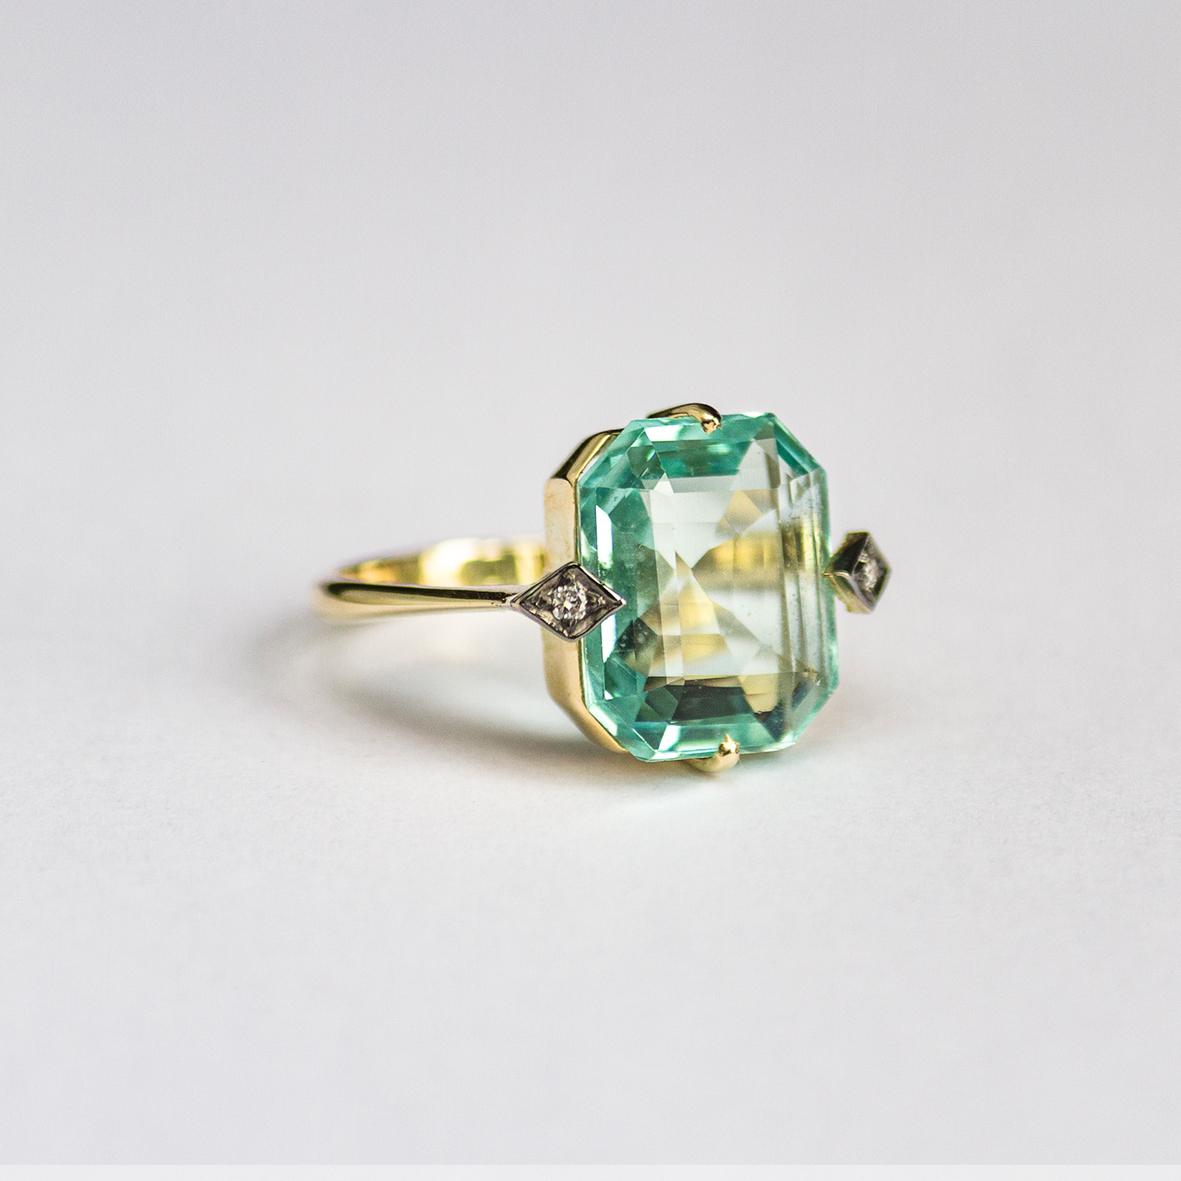 1. OONA_gems of ceylon_ficha2_green aquamarine ring